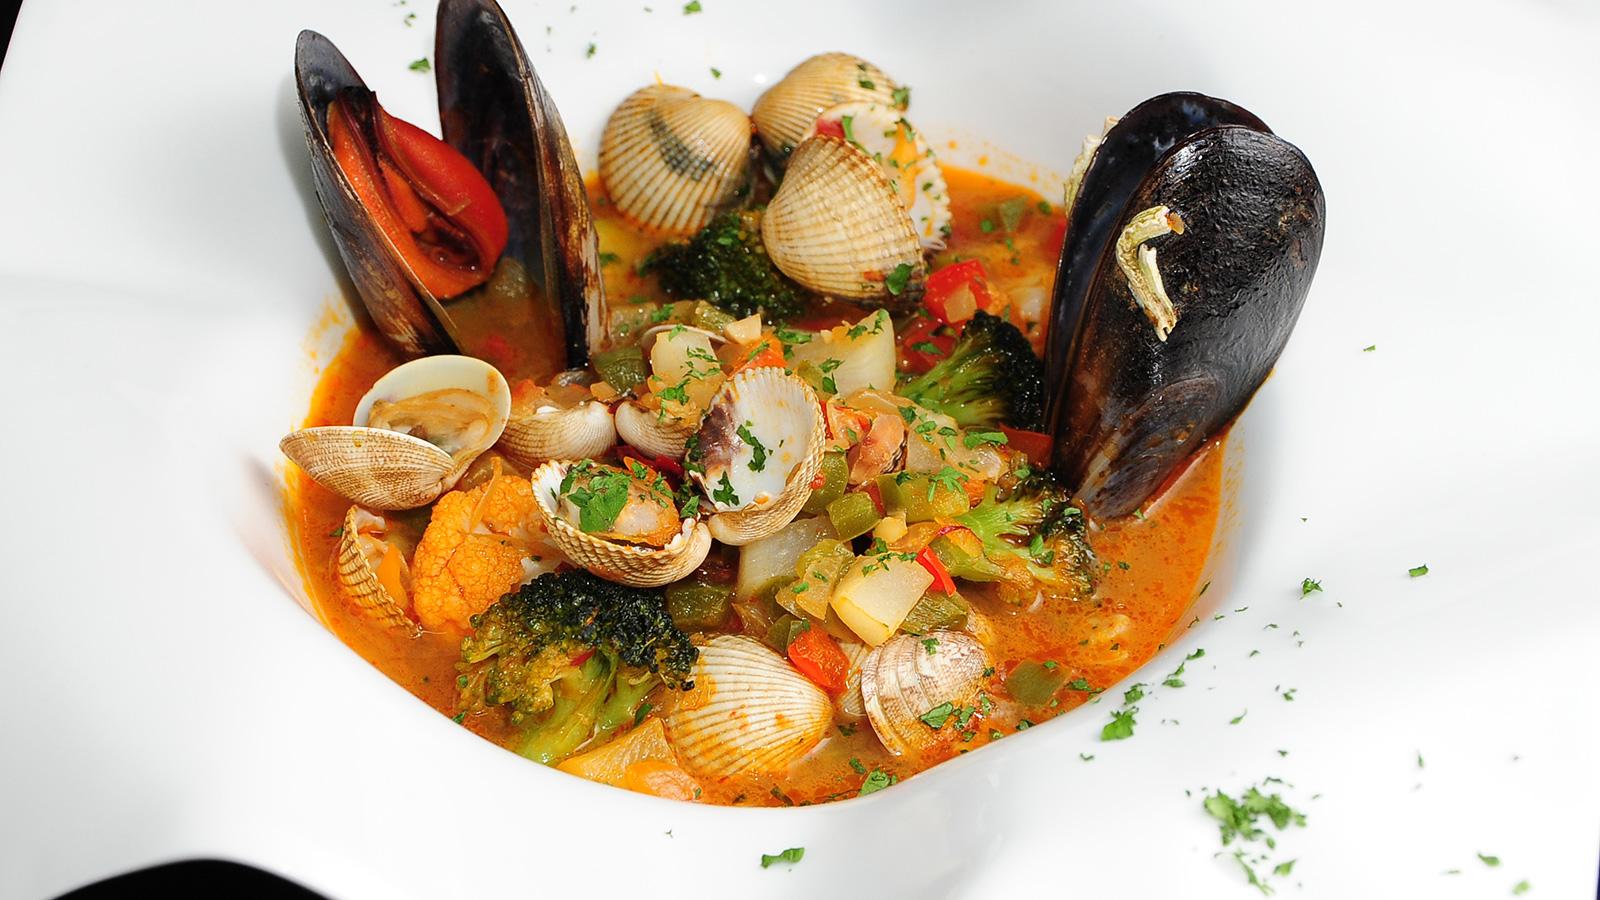 Caldereta de verduras marineras chema de isidro v zquez for Chema de isidro canal cocina